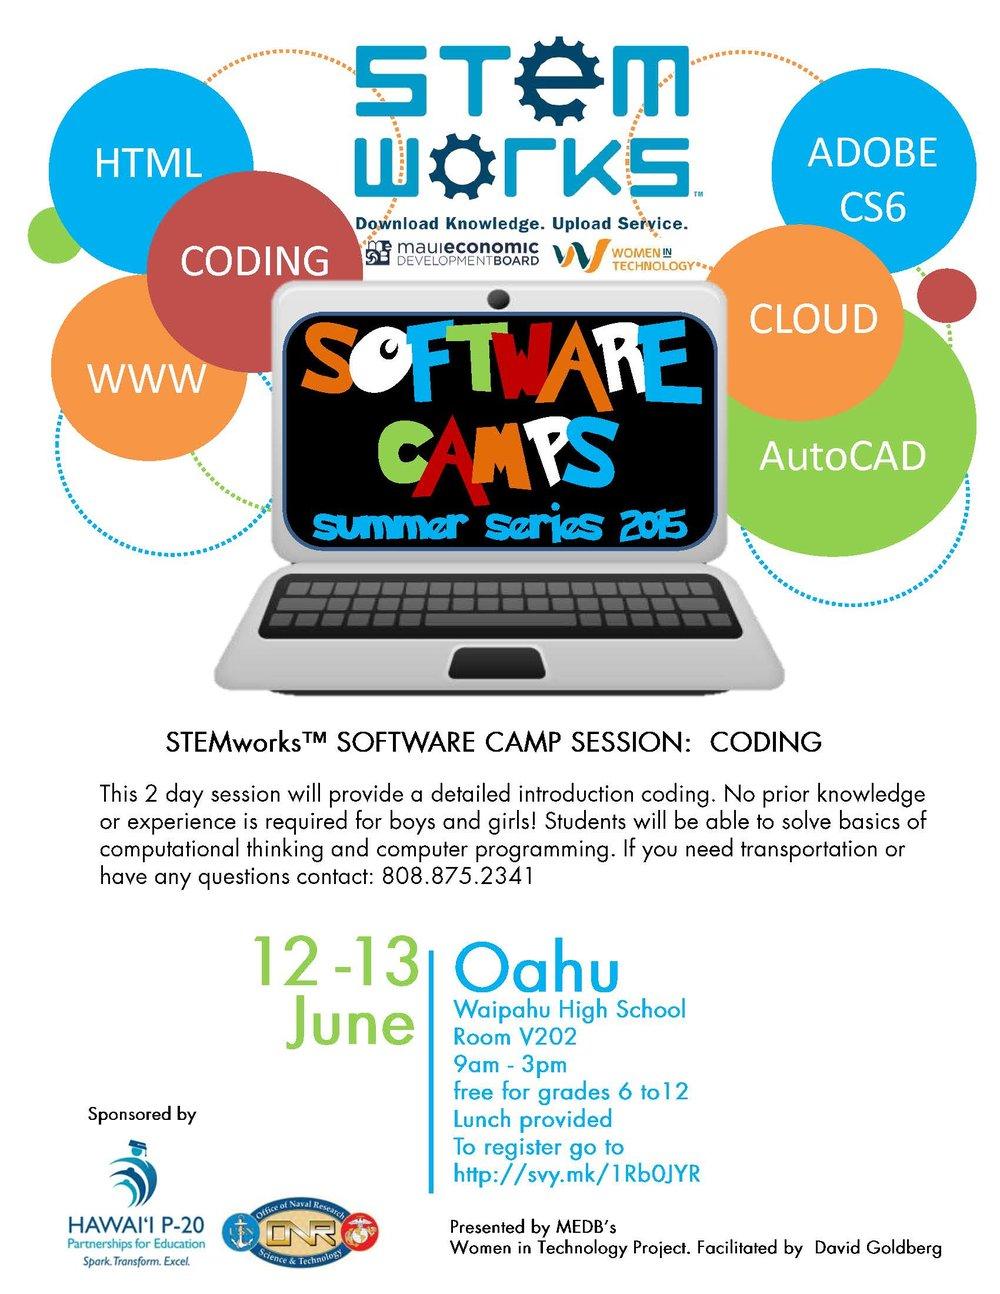 FLYER_OAHUSoftwareCamp_CODING.jpg